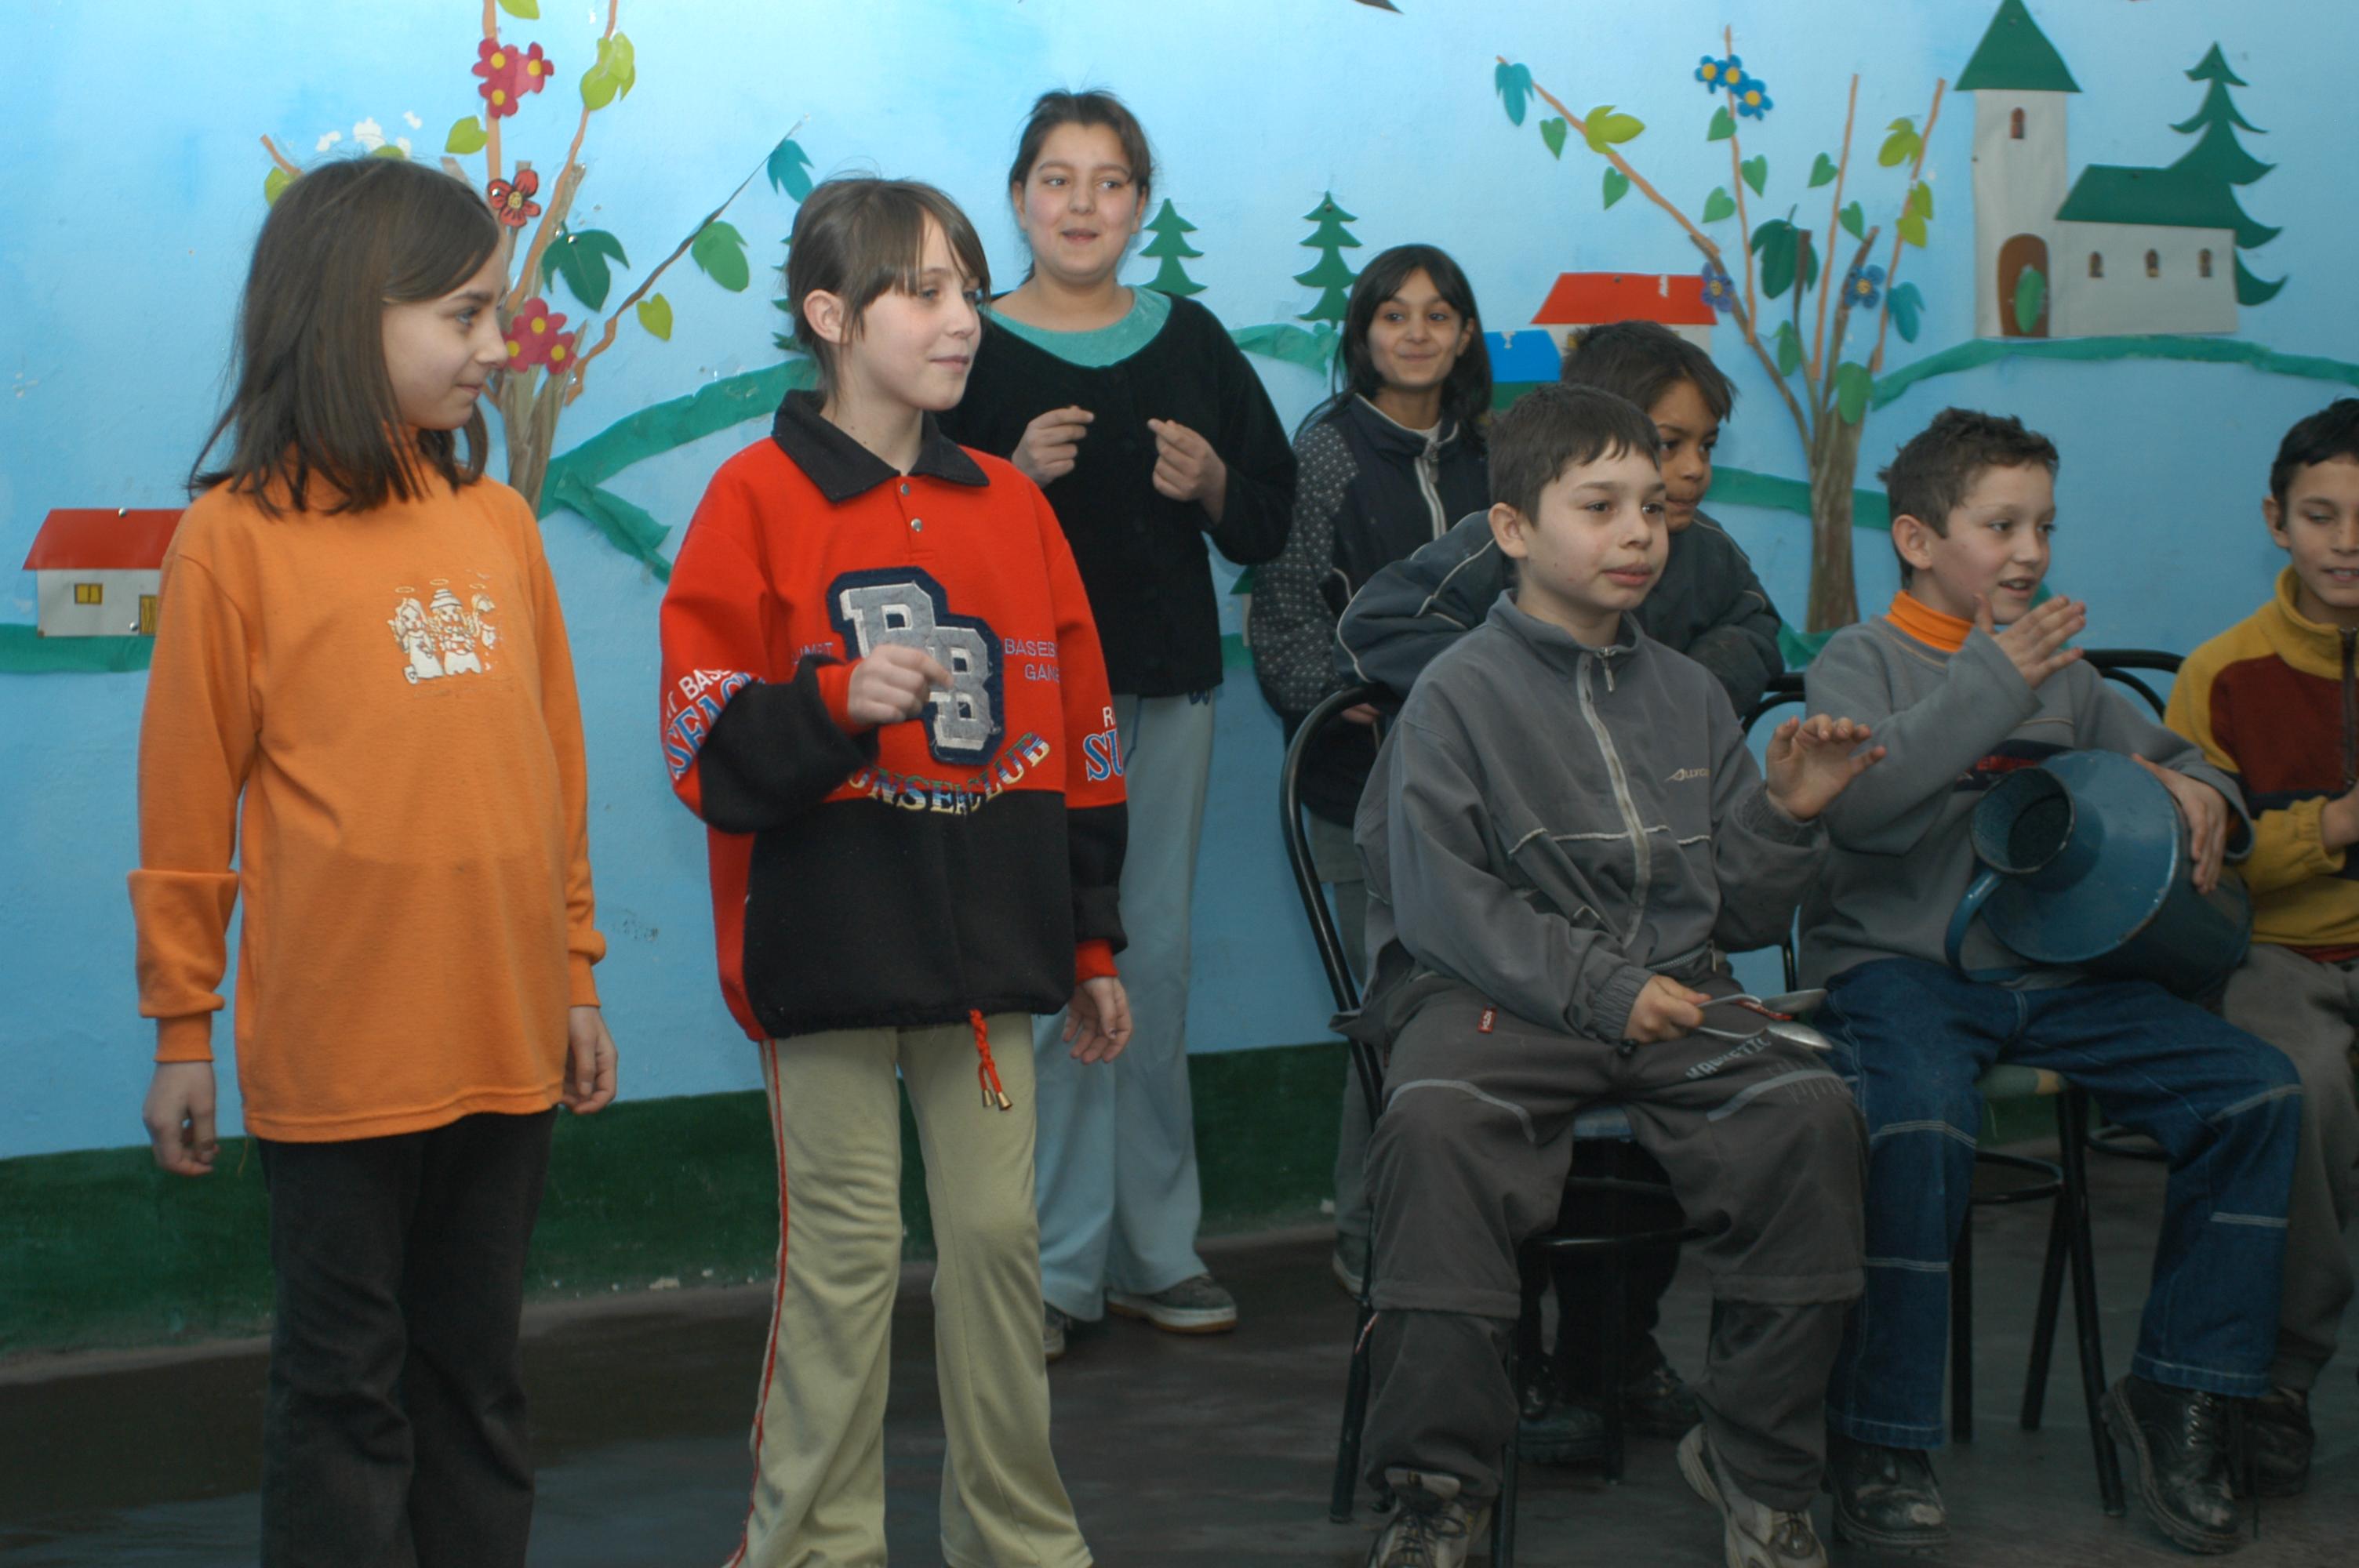 Hungary_2004_Evan_Golder_11.JPG